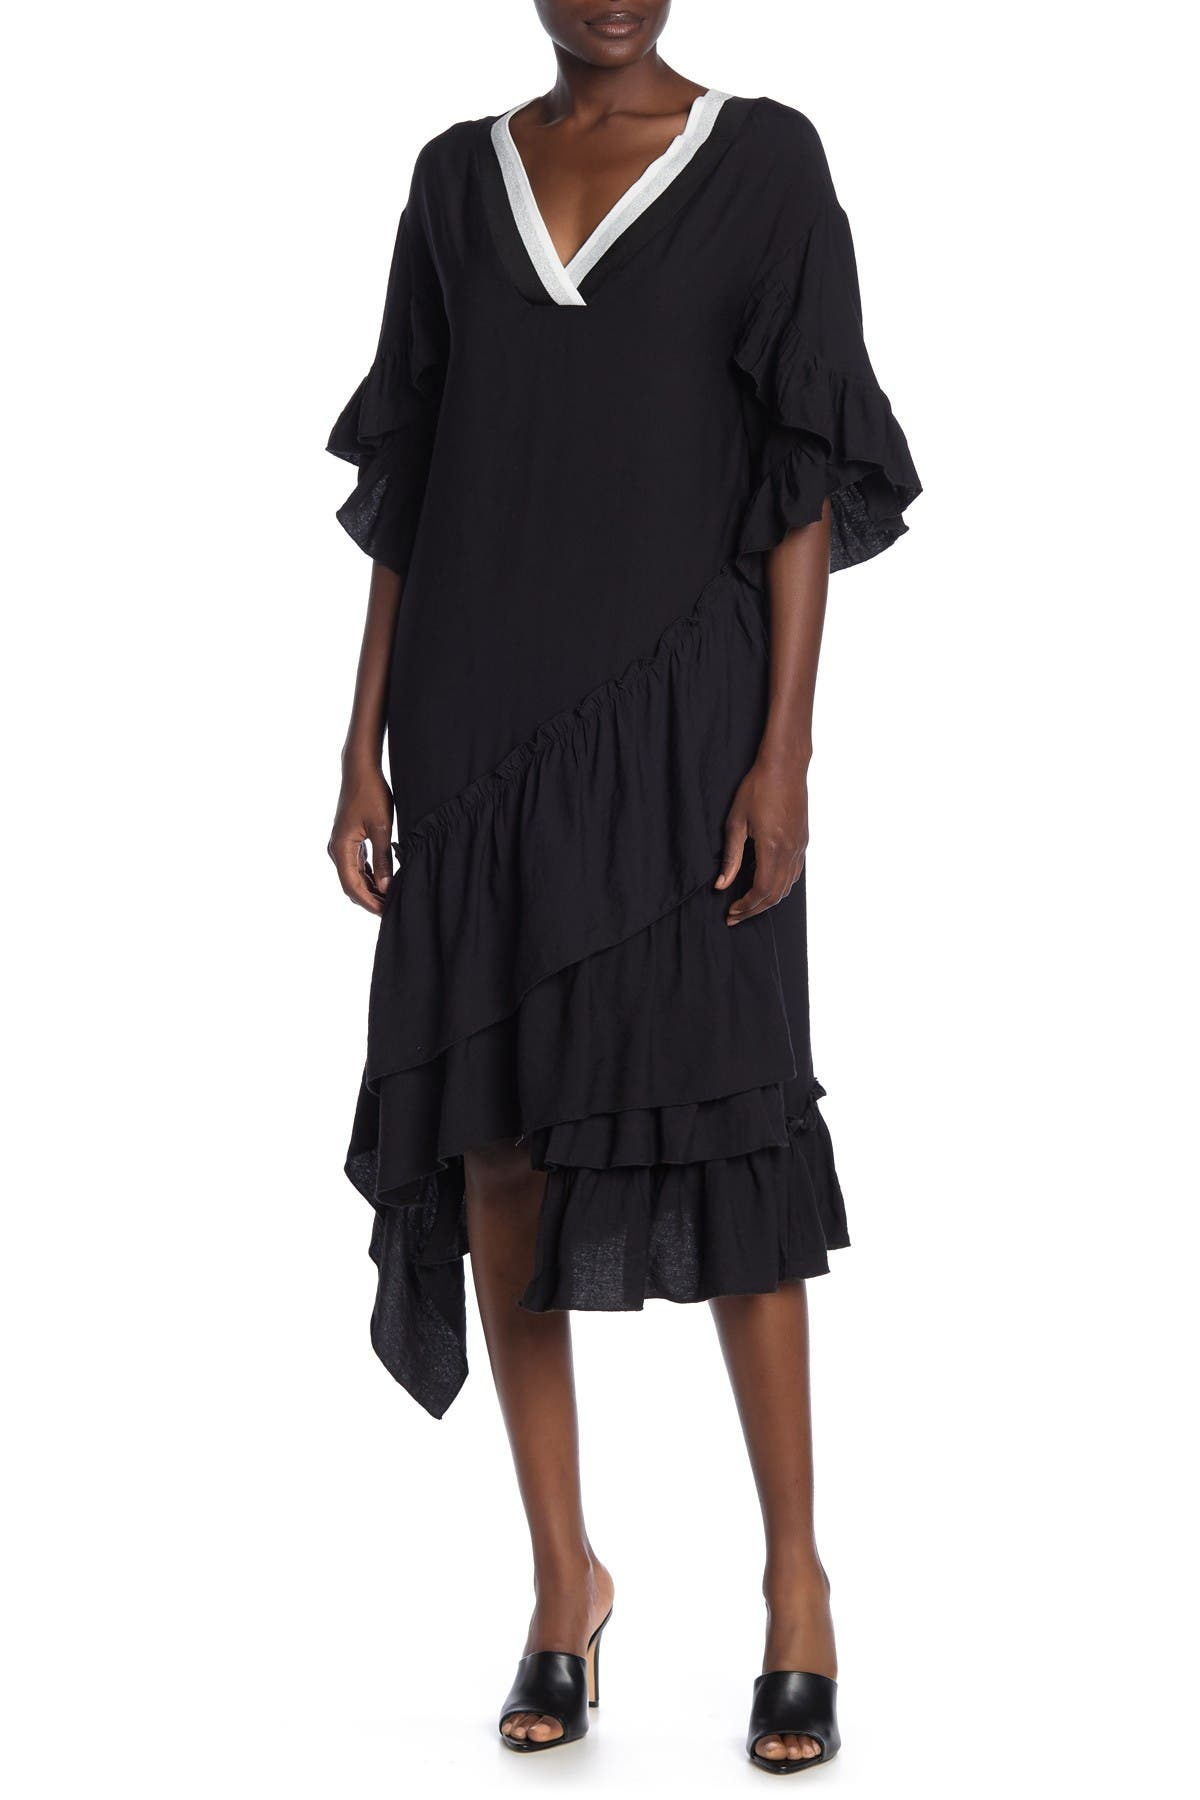 Image of TOV Metallic Knit Sheath Dress